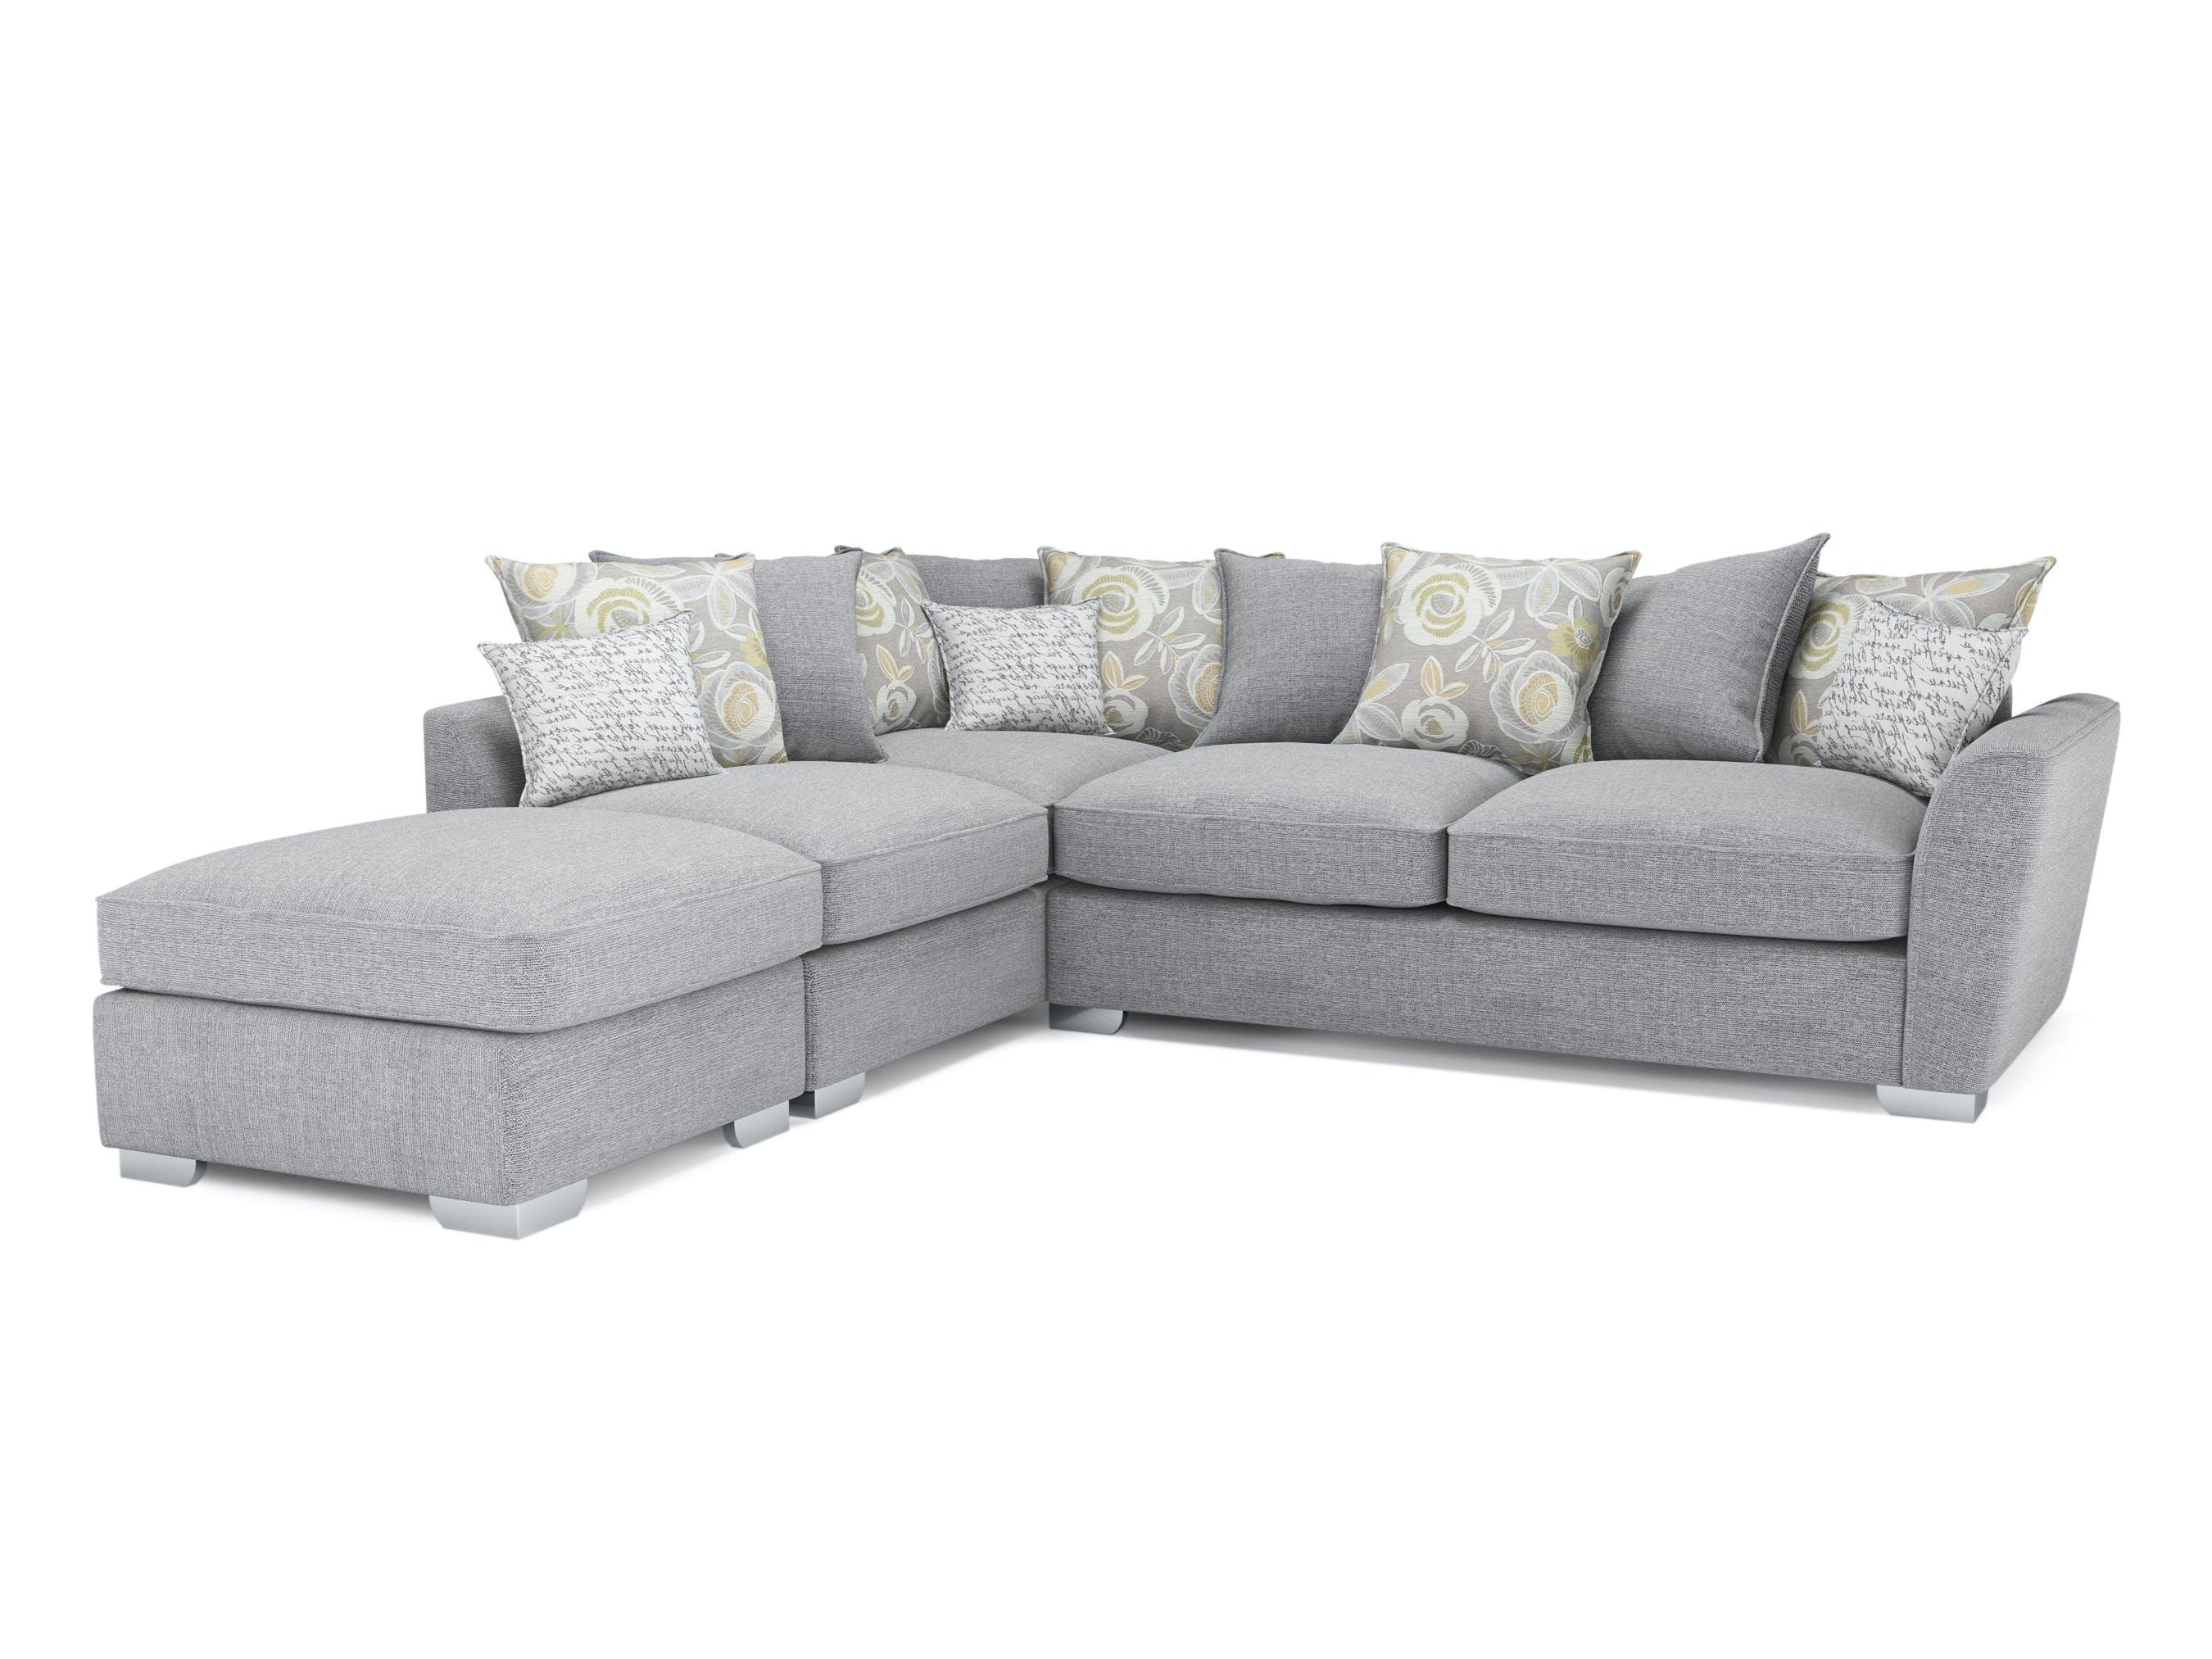 Fantasia corner sofa with footstool ireland fantasia corner sofa with footstool parisarafo Image collections